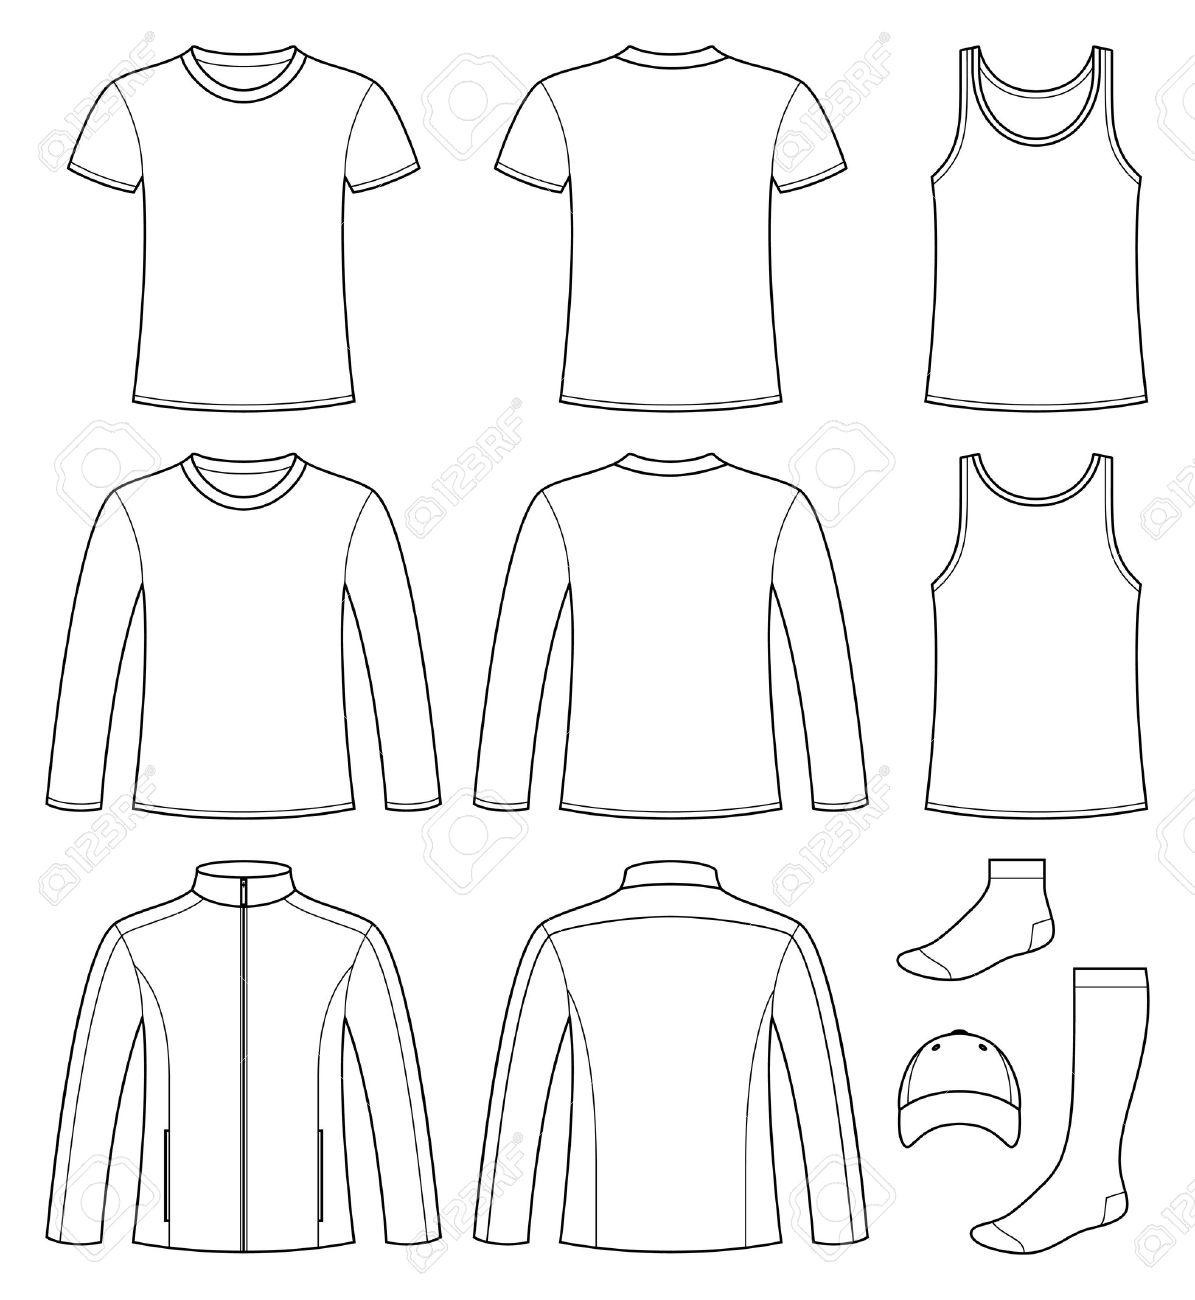 Singlet T Shirt Long Sleeved T Shirt Jacket Socks And Cap